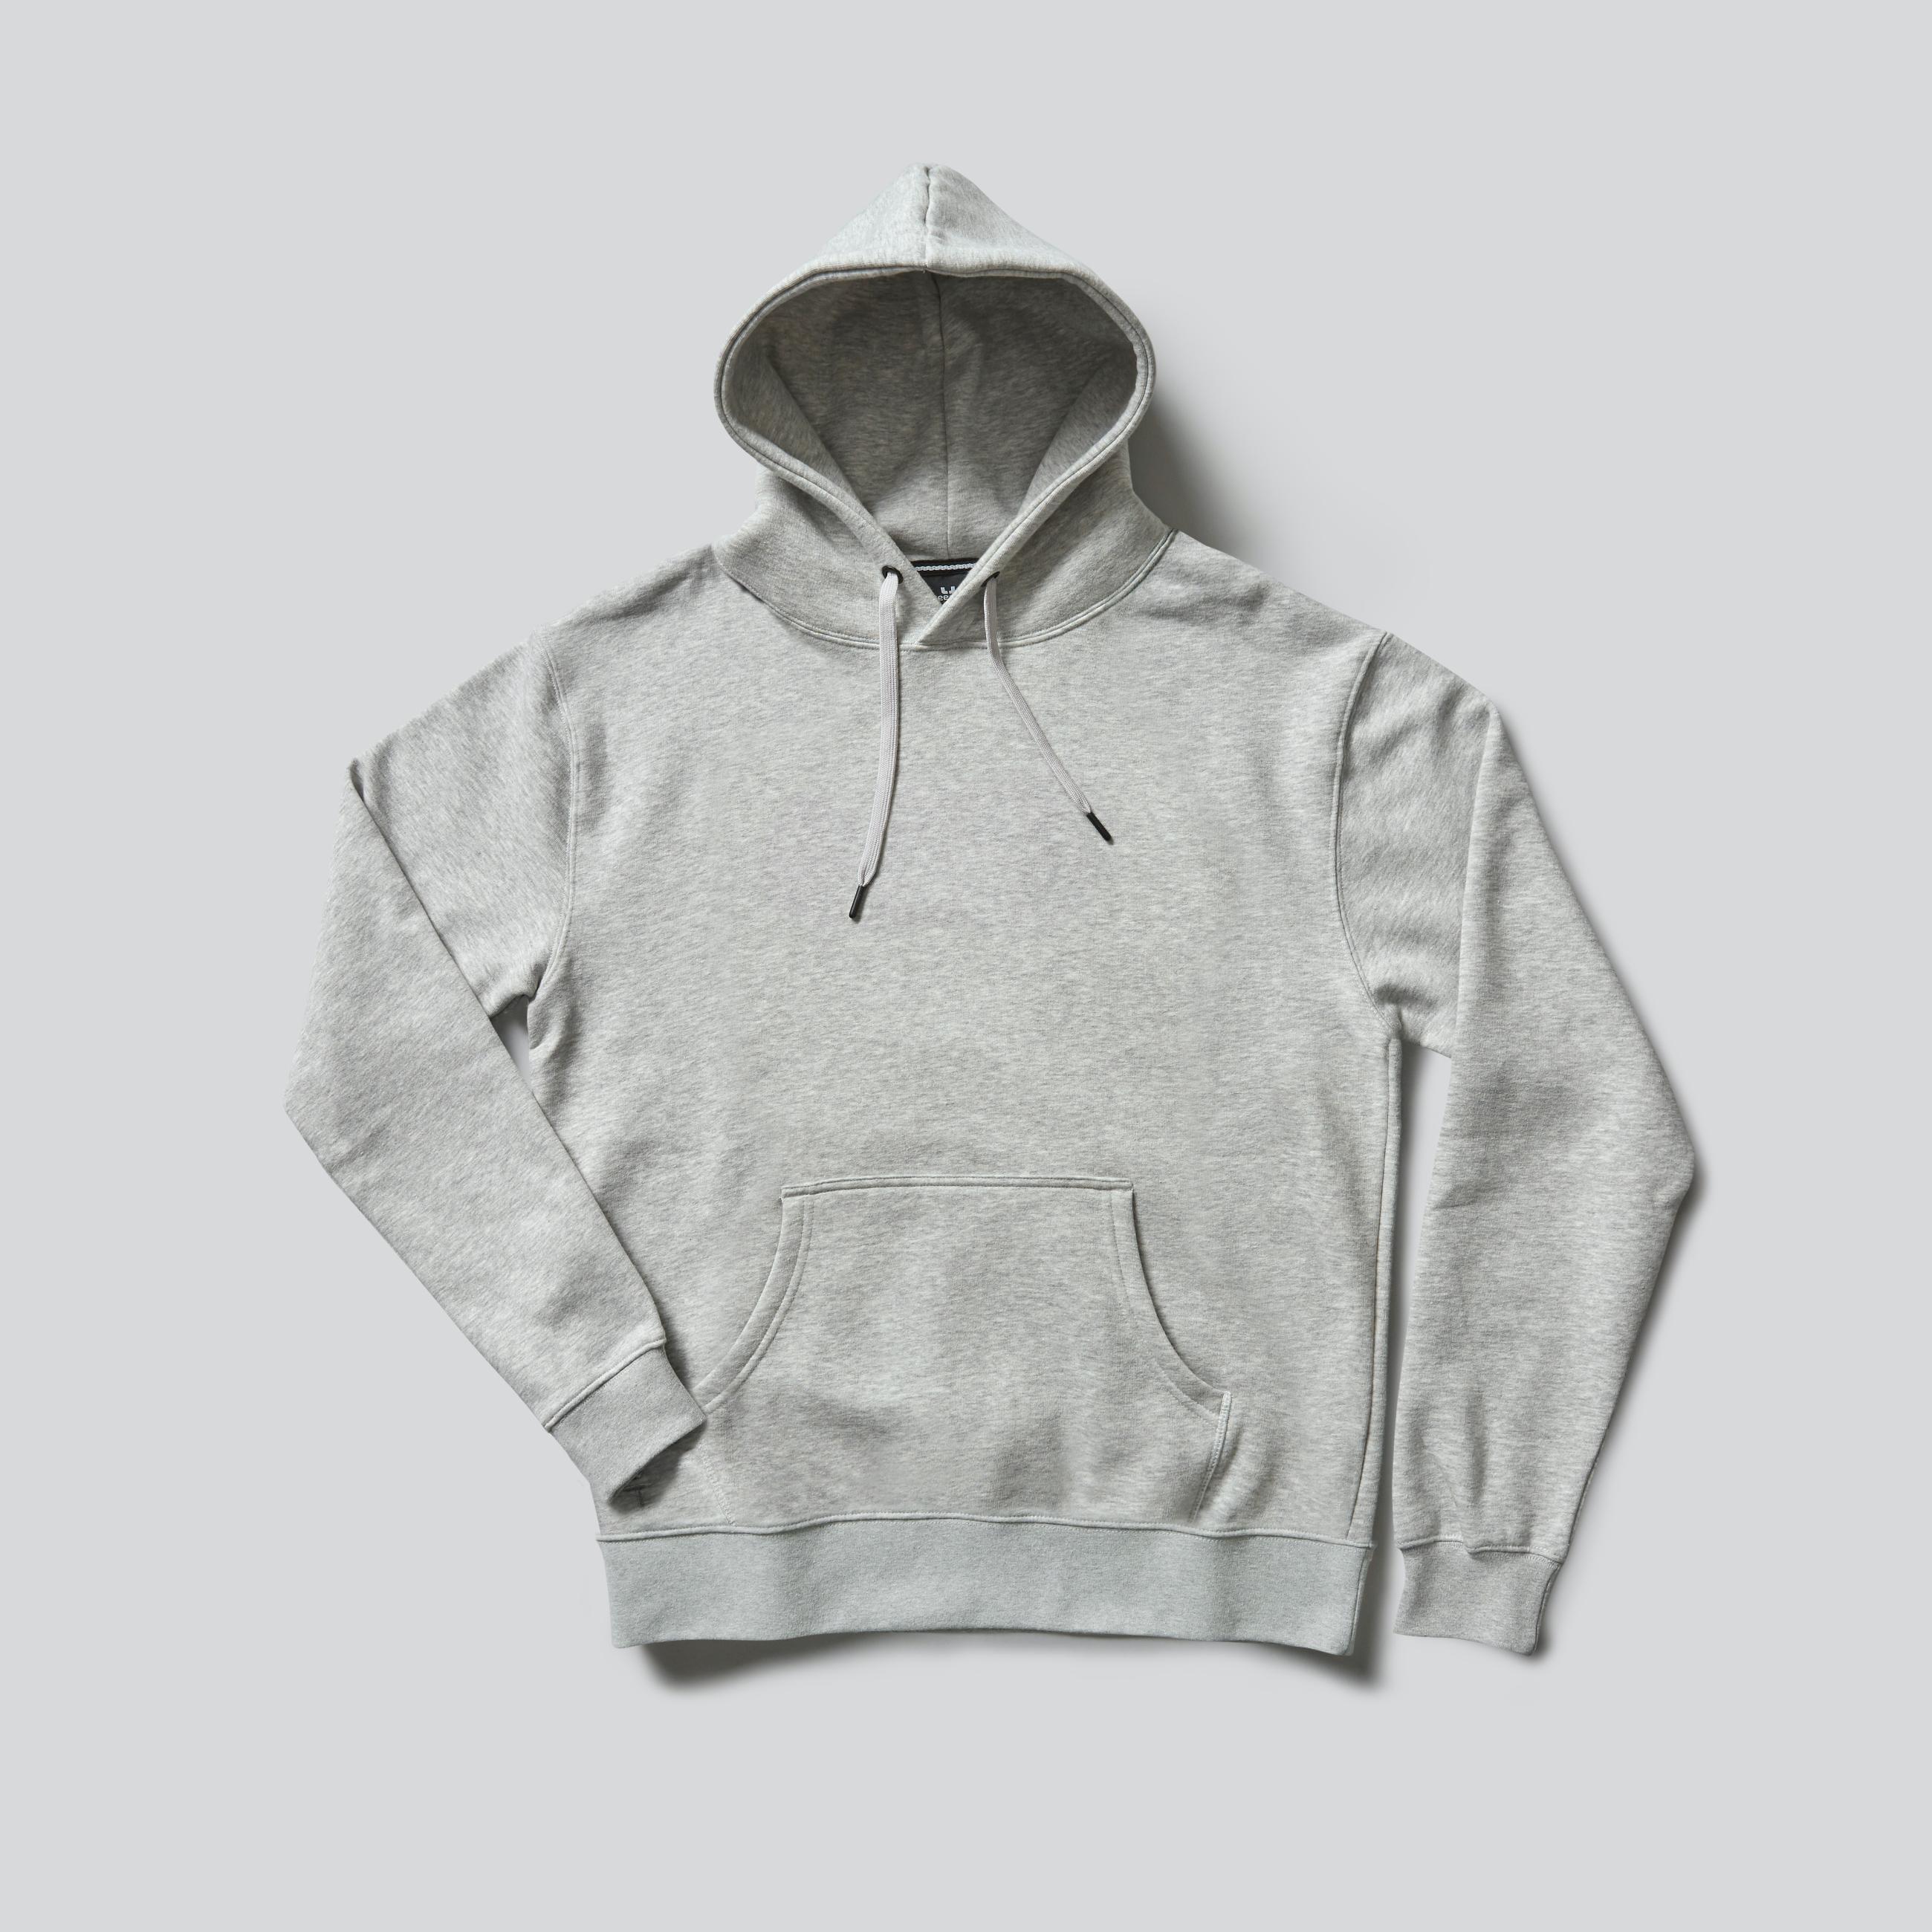 Signature Hooded Sweatshirt